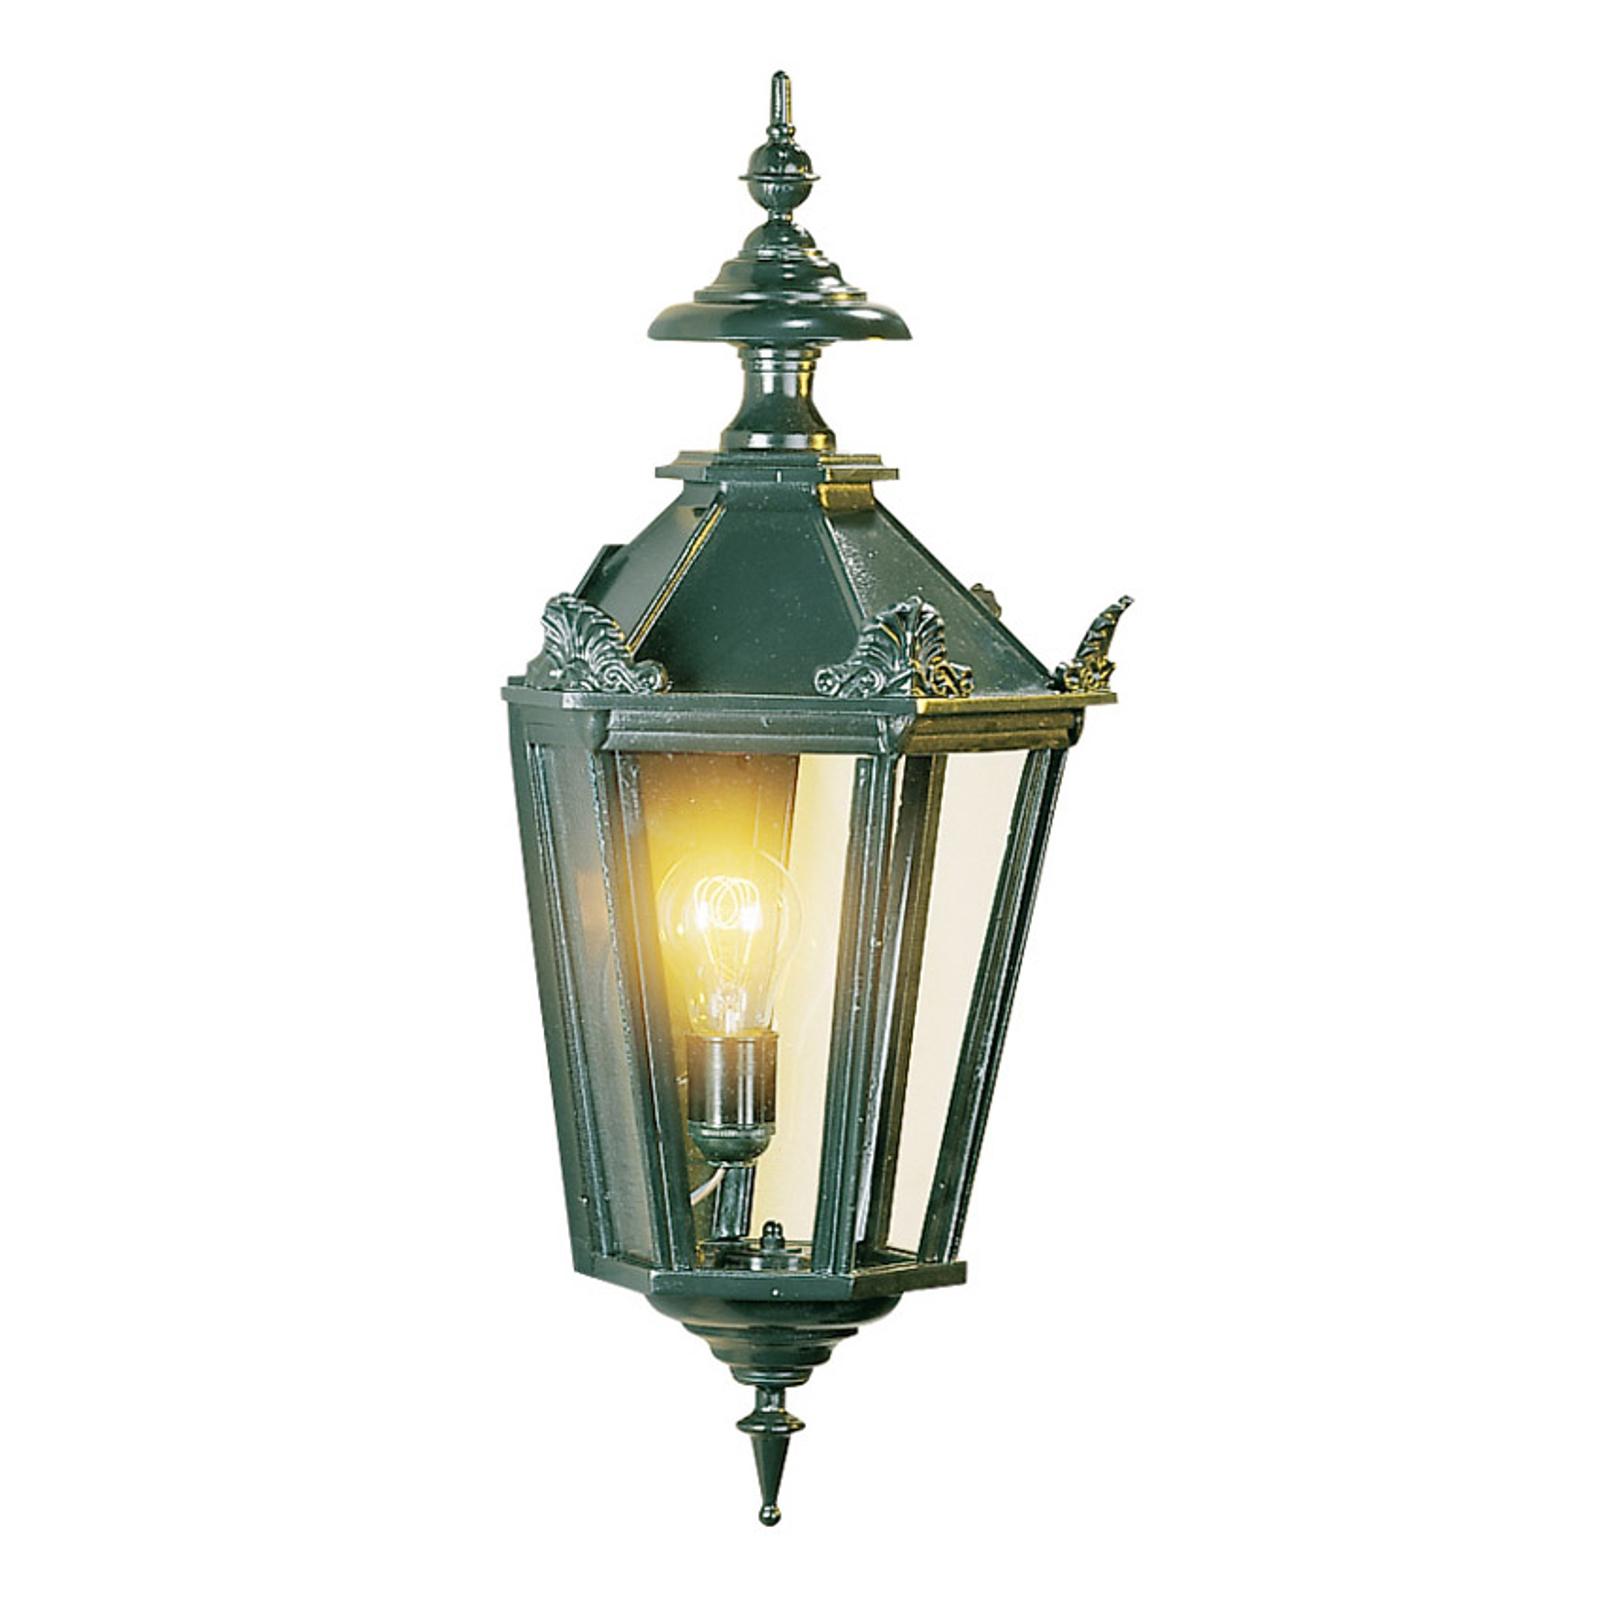 Buitenwandlamp Oxford, groen